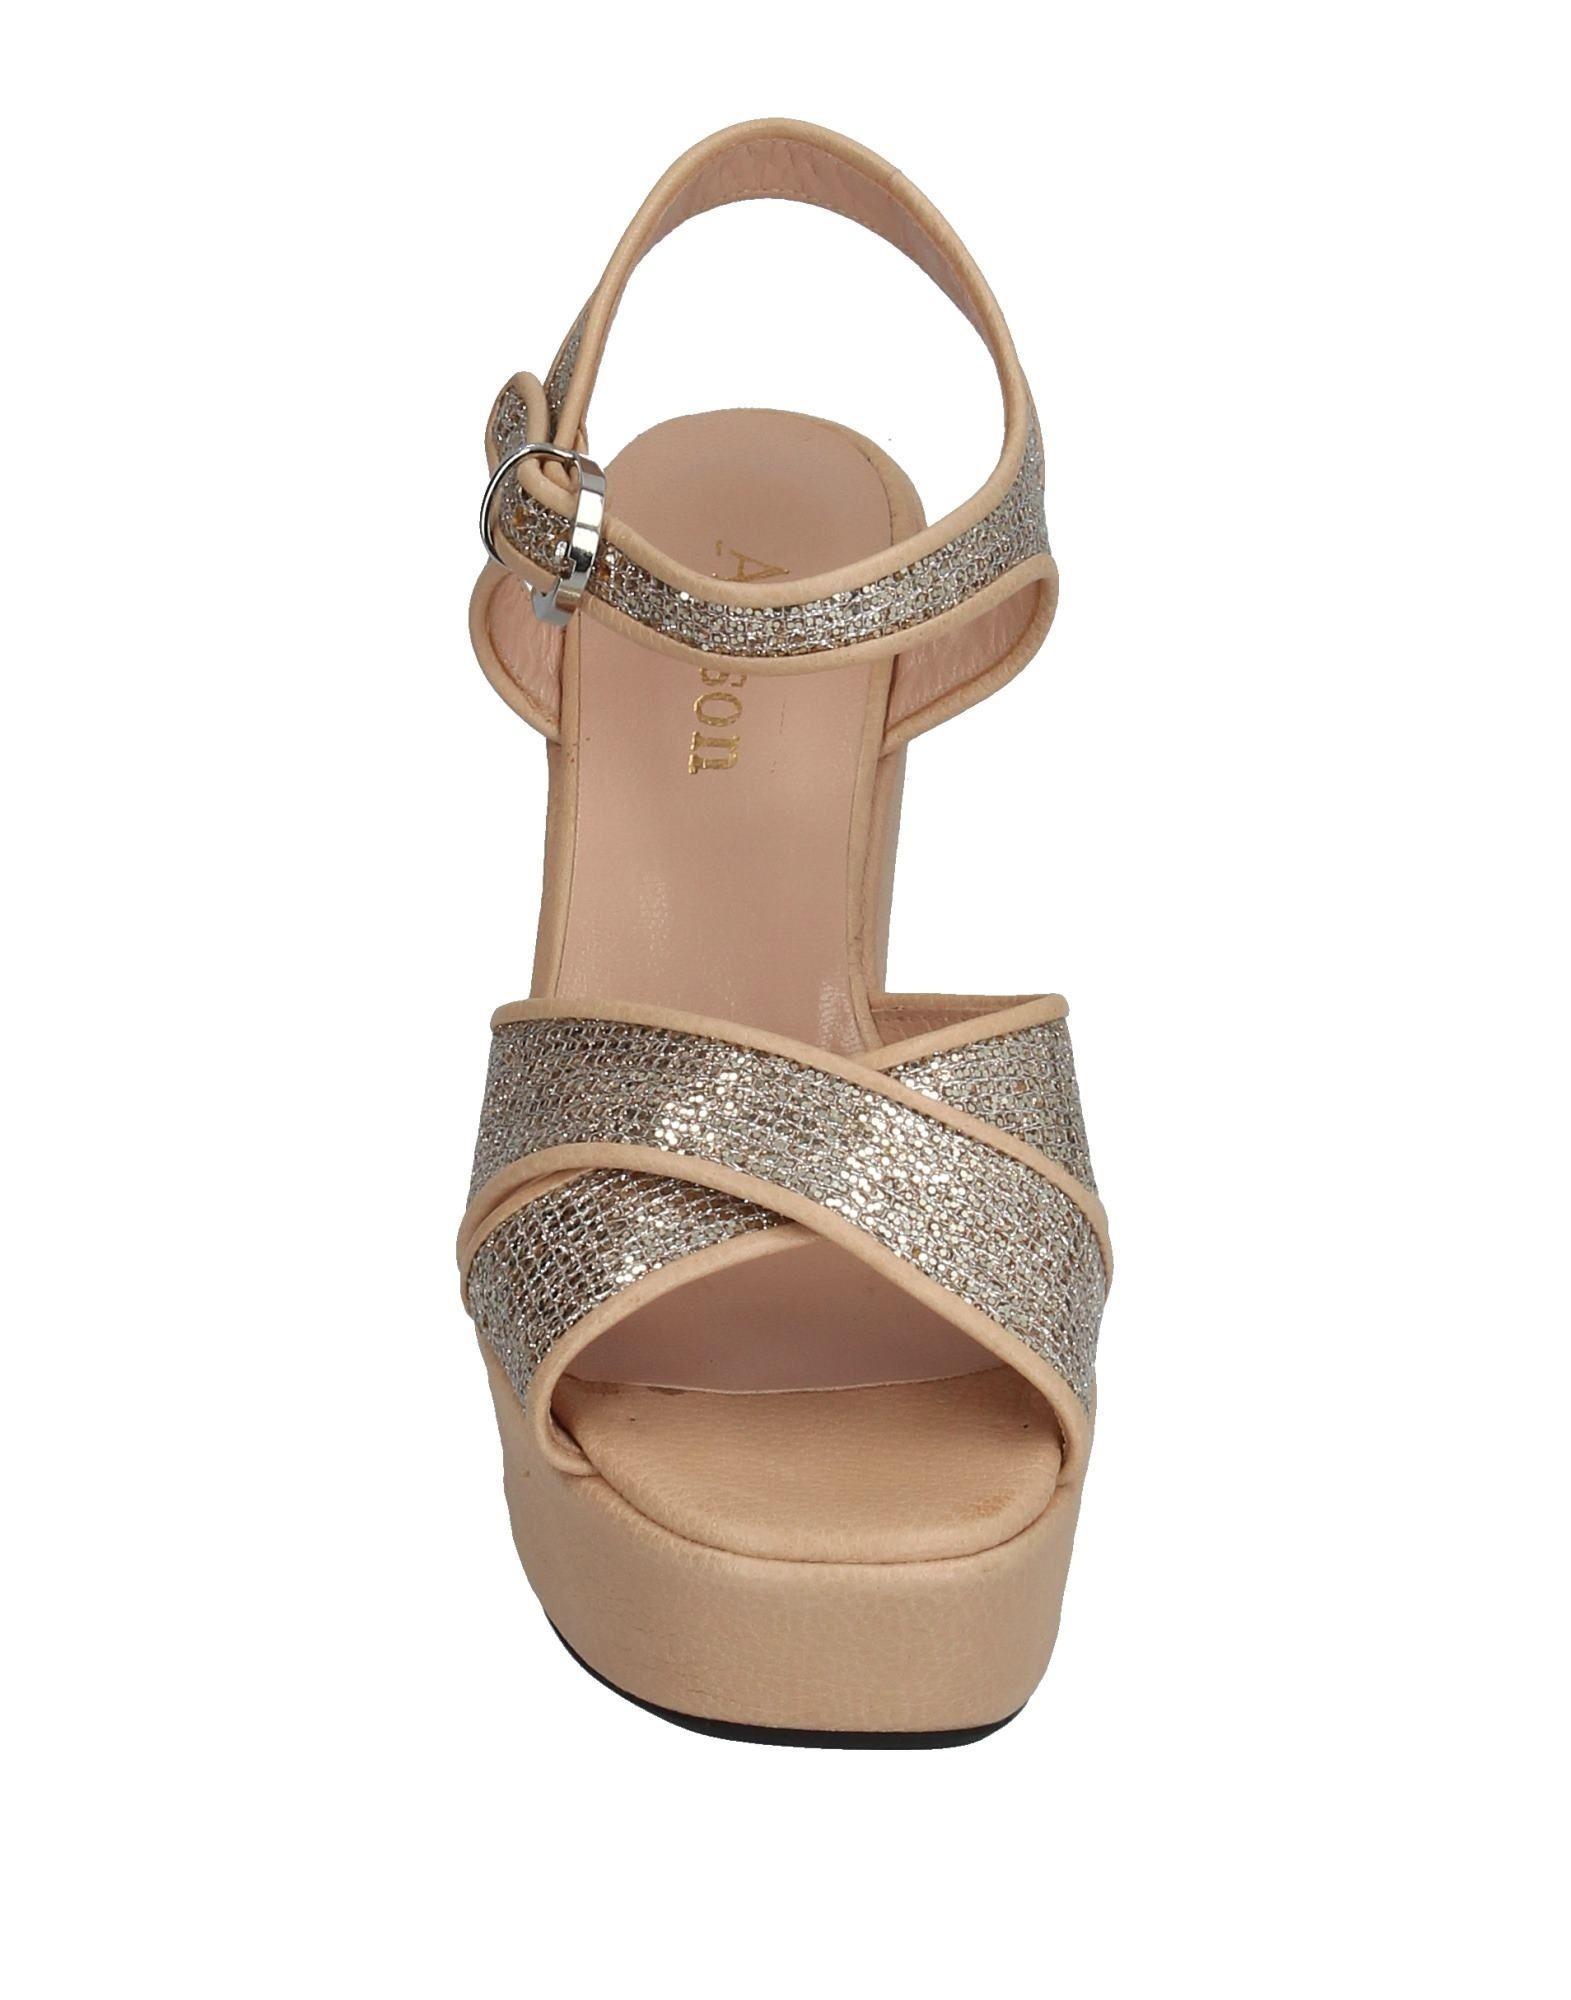 Allison Sandalen Damen  11356663MX Gute Qualität beliebte Schuhe